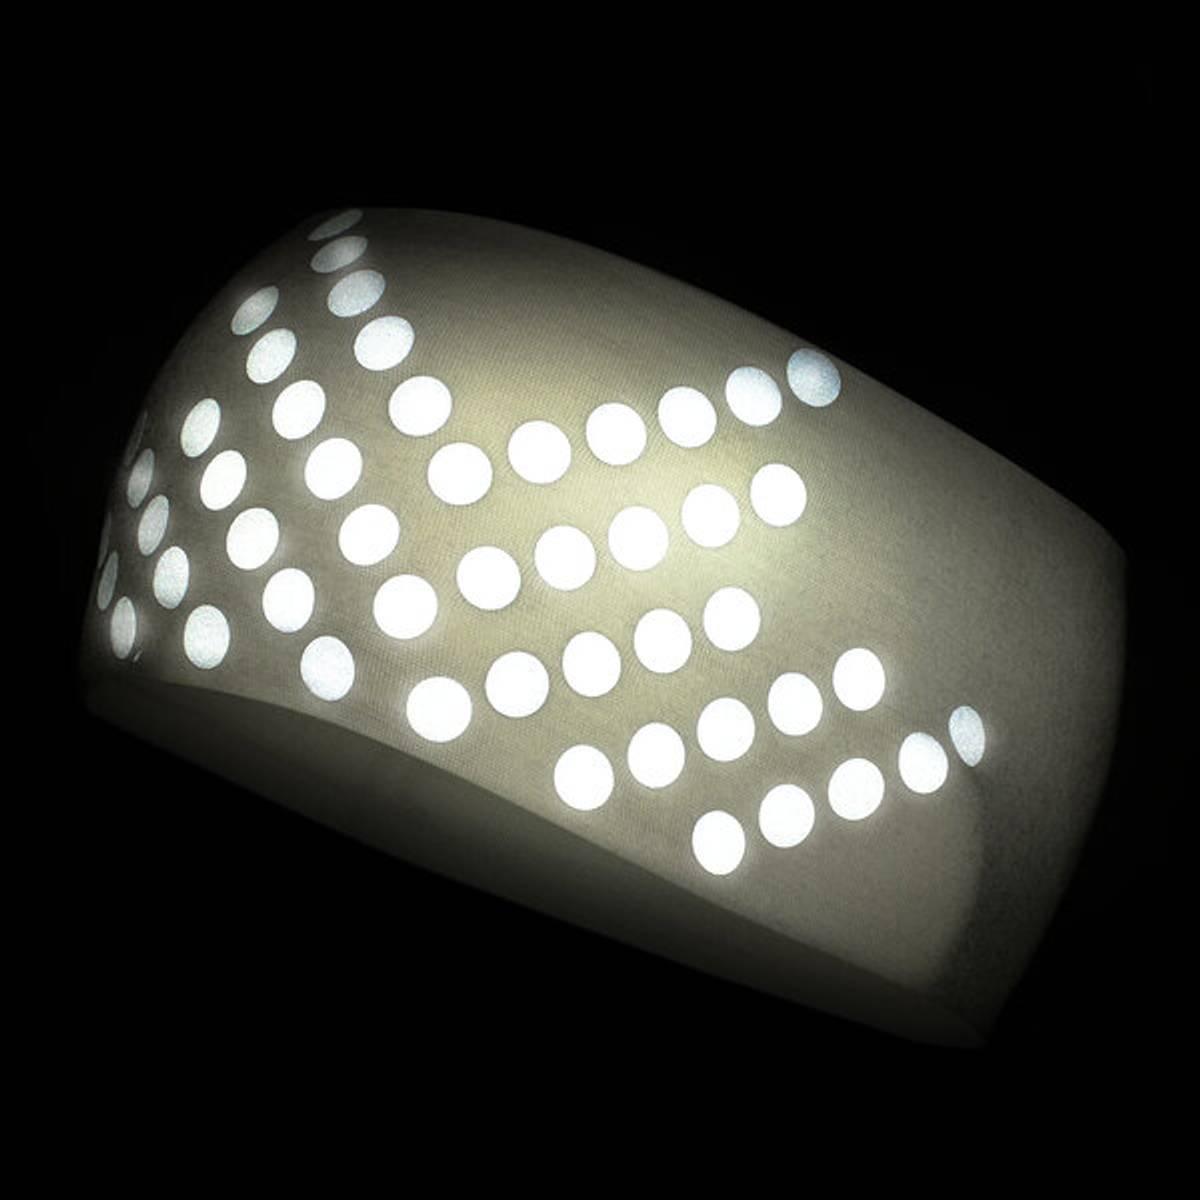 Morild Sølvfaks pannebånd med refleks, hvit